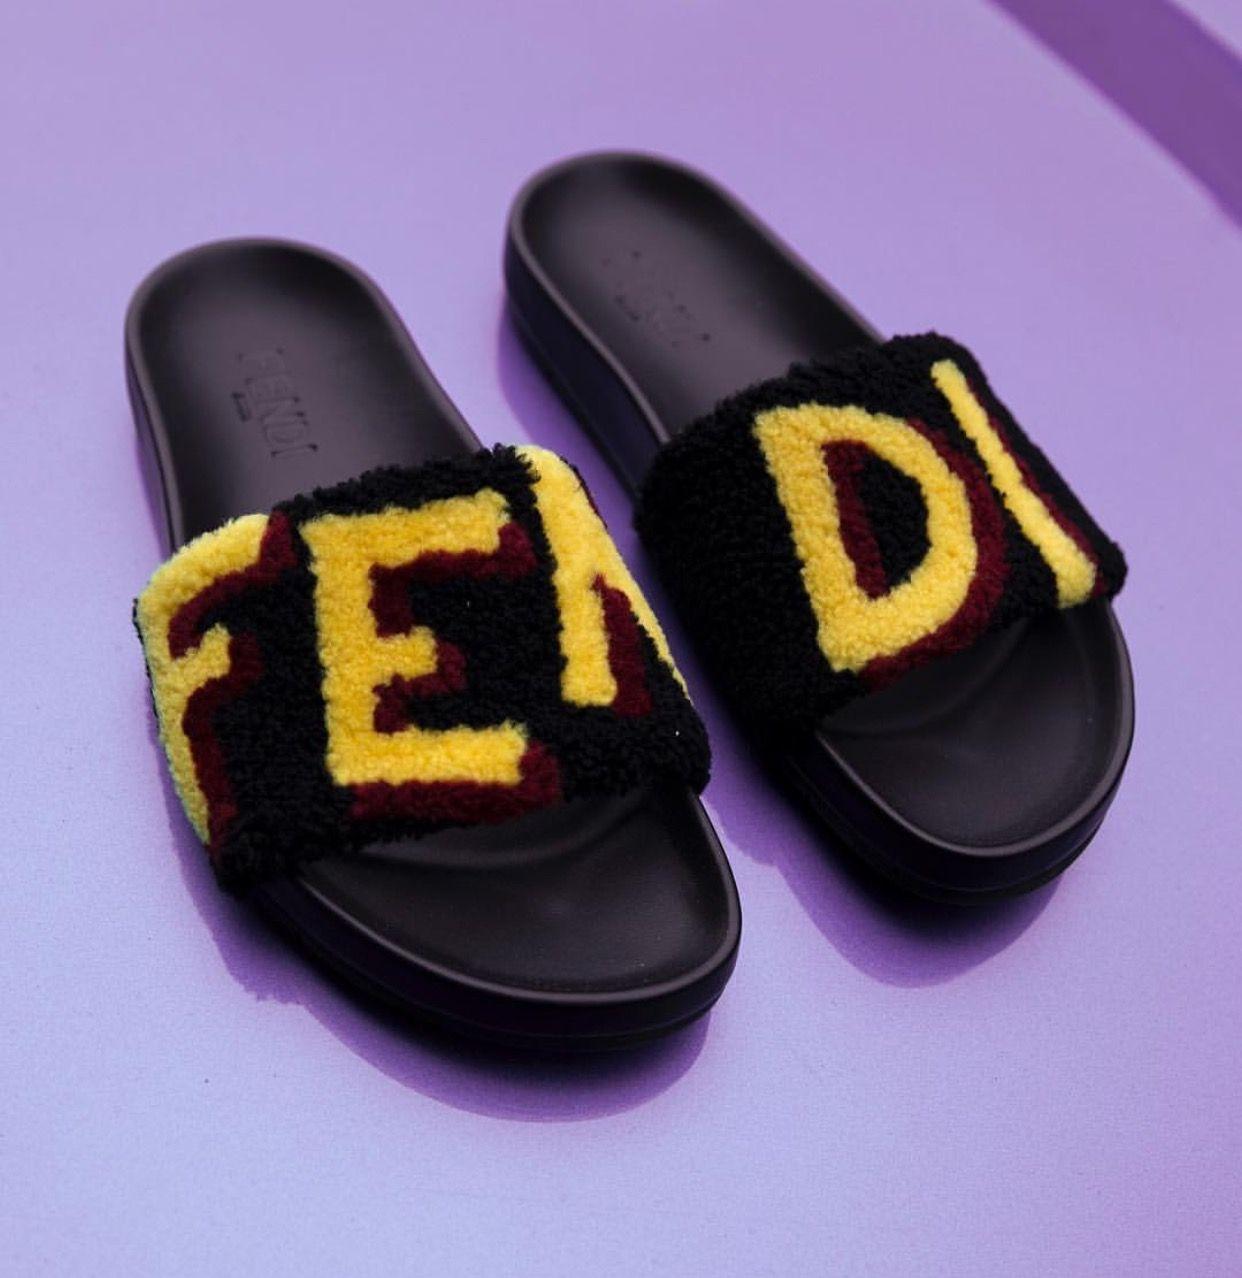 Fendi Fur Slides Stylish Shoes Pinterest Fur Slides